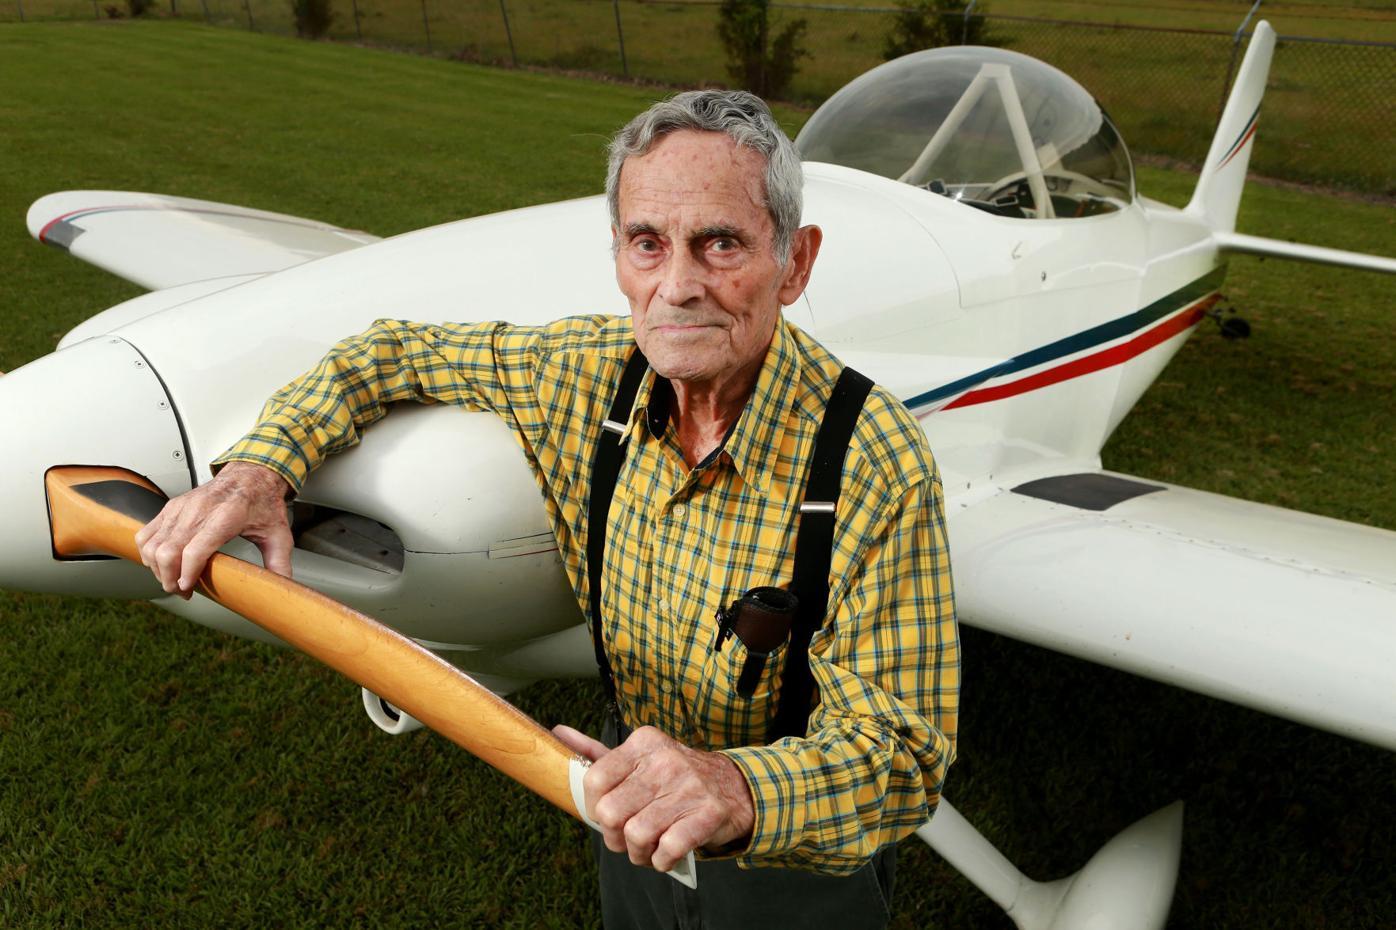 djr-2021-06-06-liv-airplane-maker-arp1